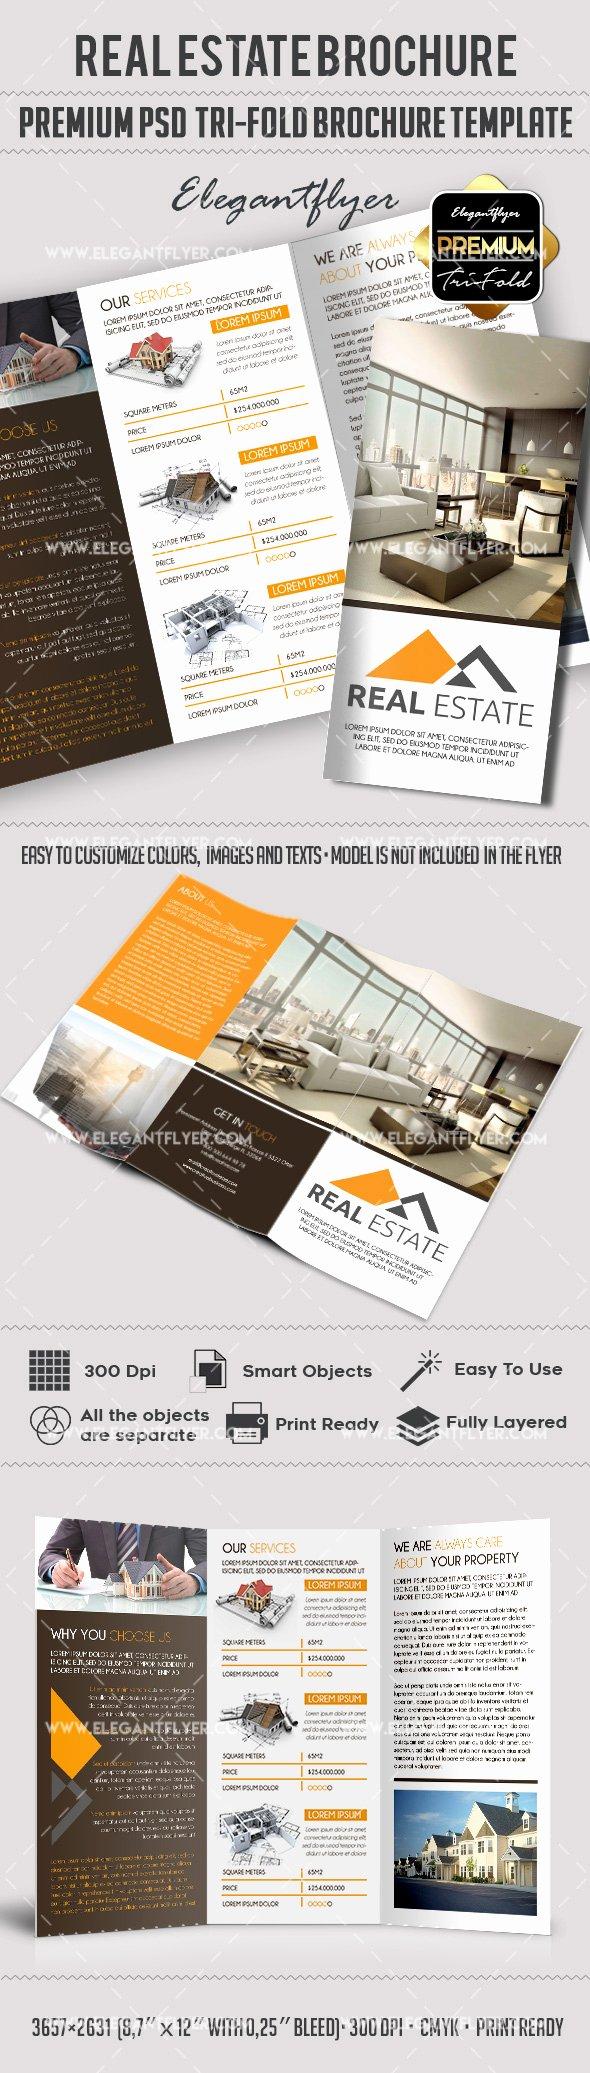 2 Fold Brochure Template Elegant Psd Brochure for Mercial Real Estate – by Elegantflyer